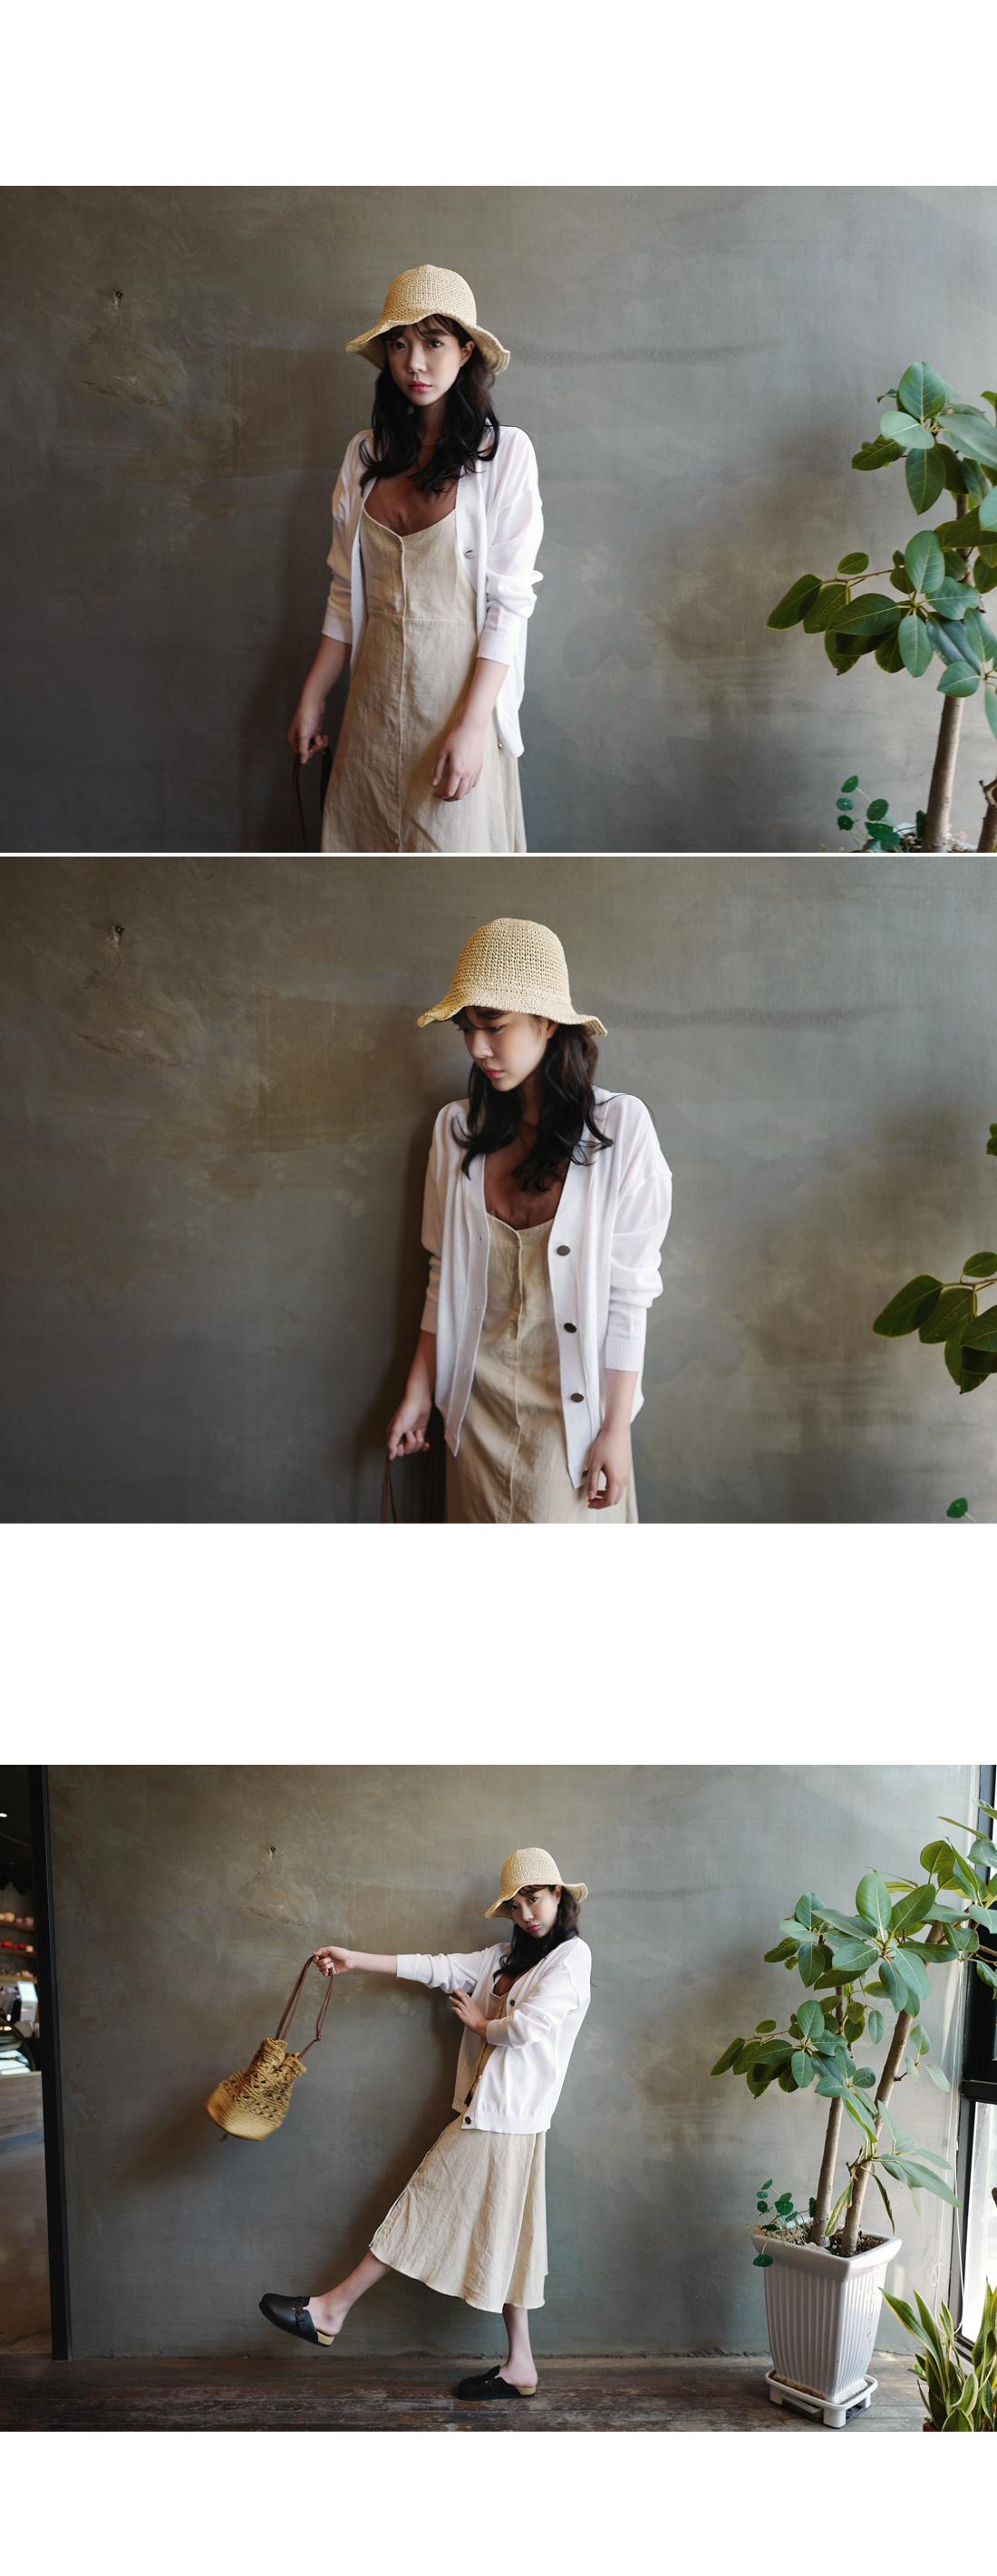 Aqua Knit Cardigan - White